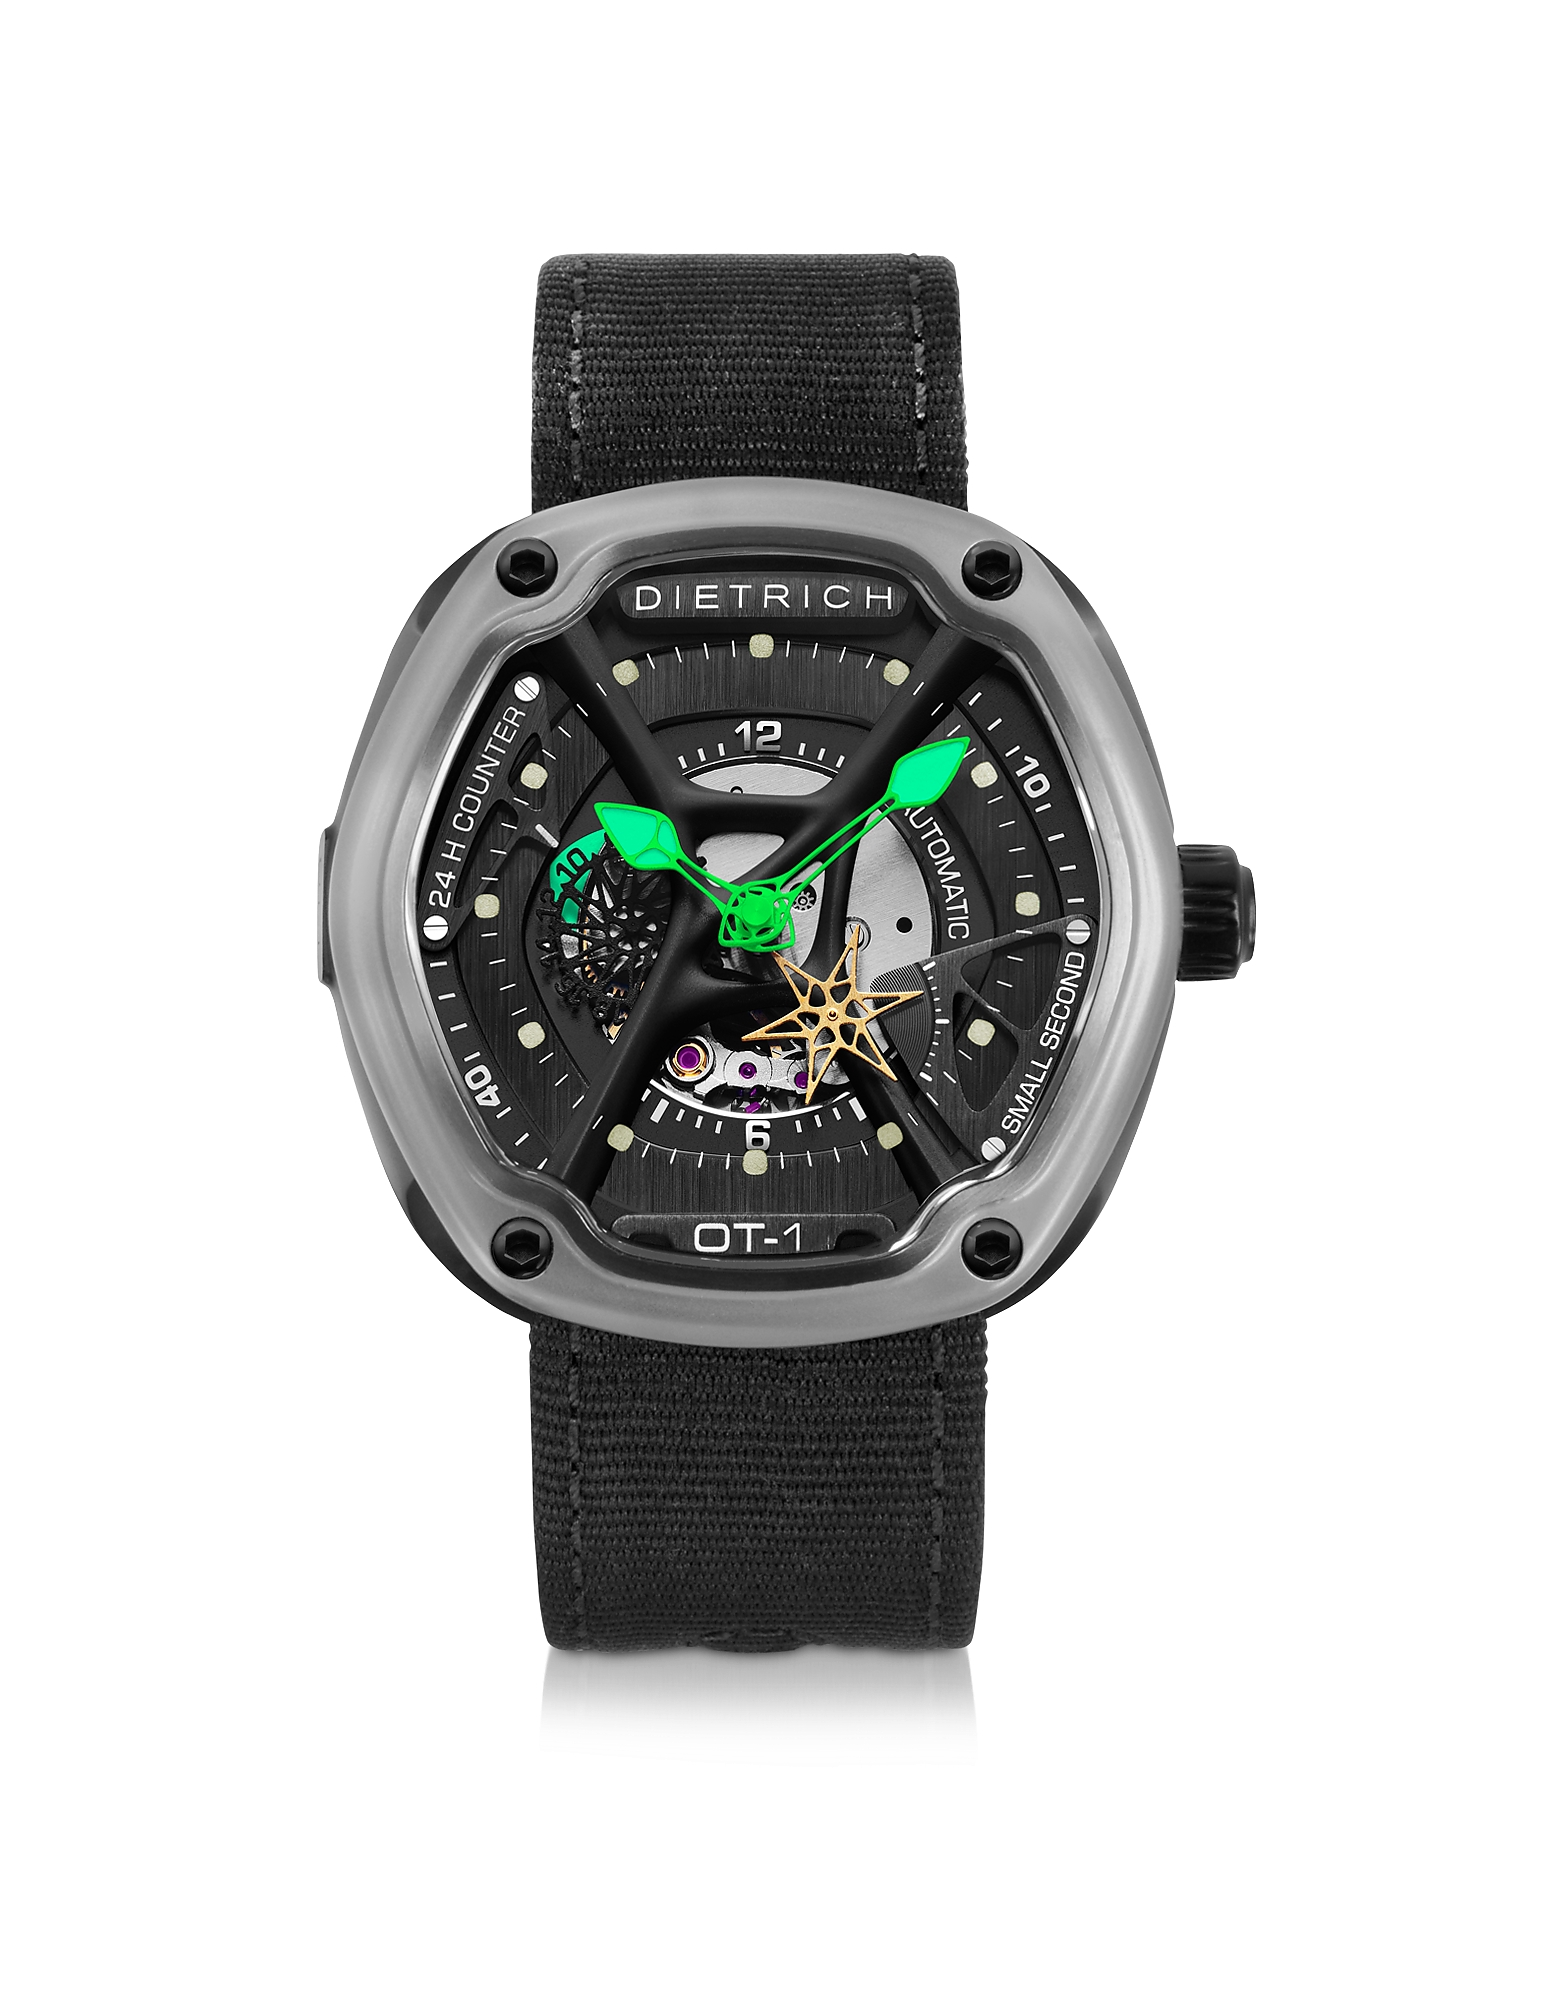 Dietrich Men's Watches, OT-1 316L Steel Men's Watch w/Green Luminova and Nylon Strap